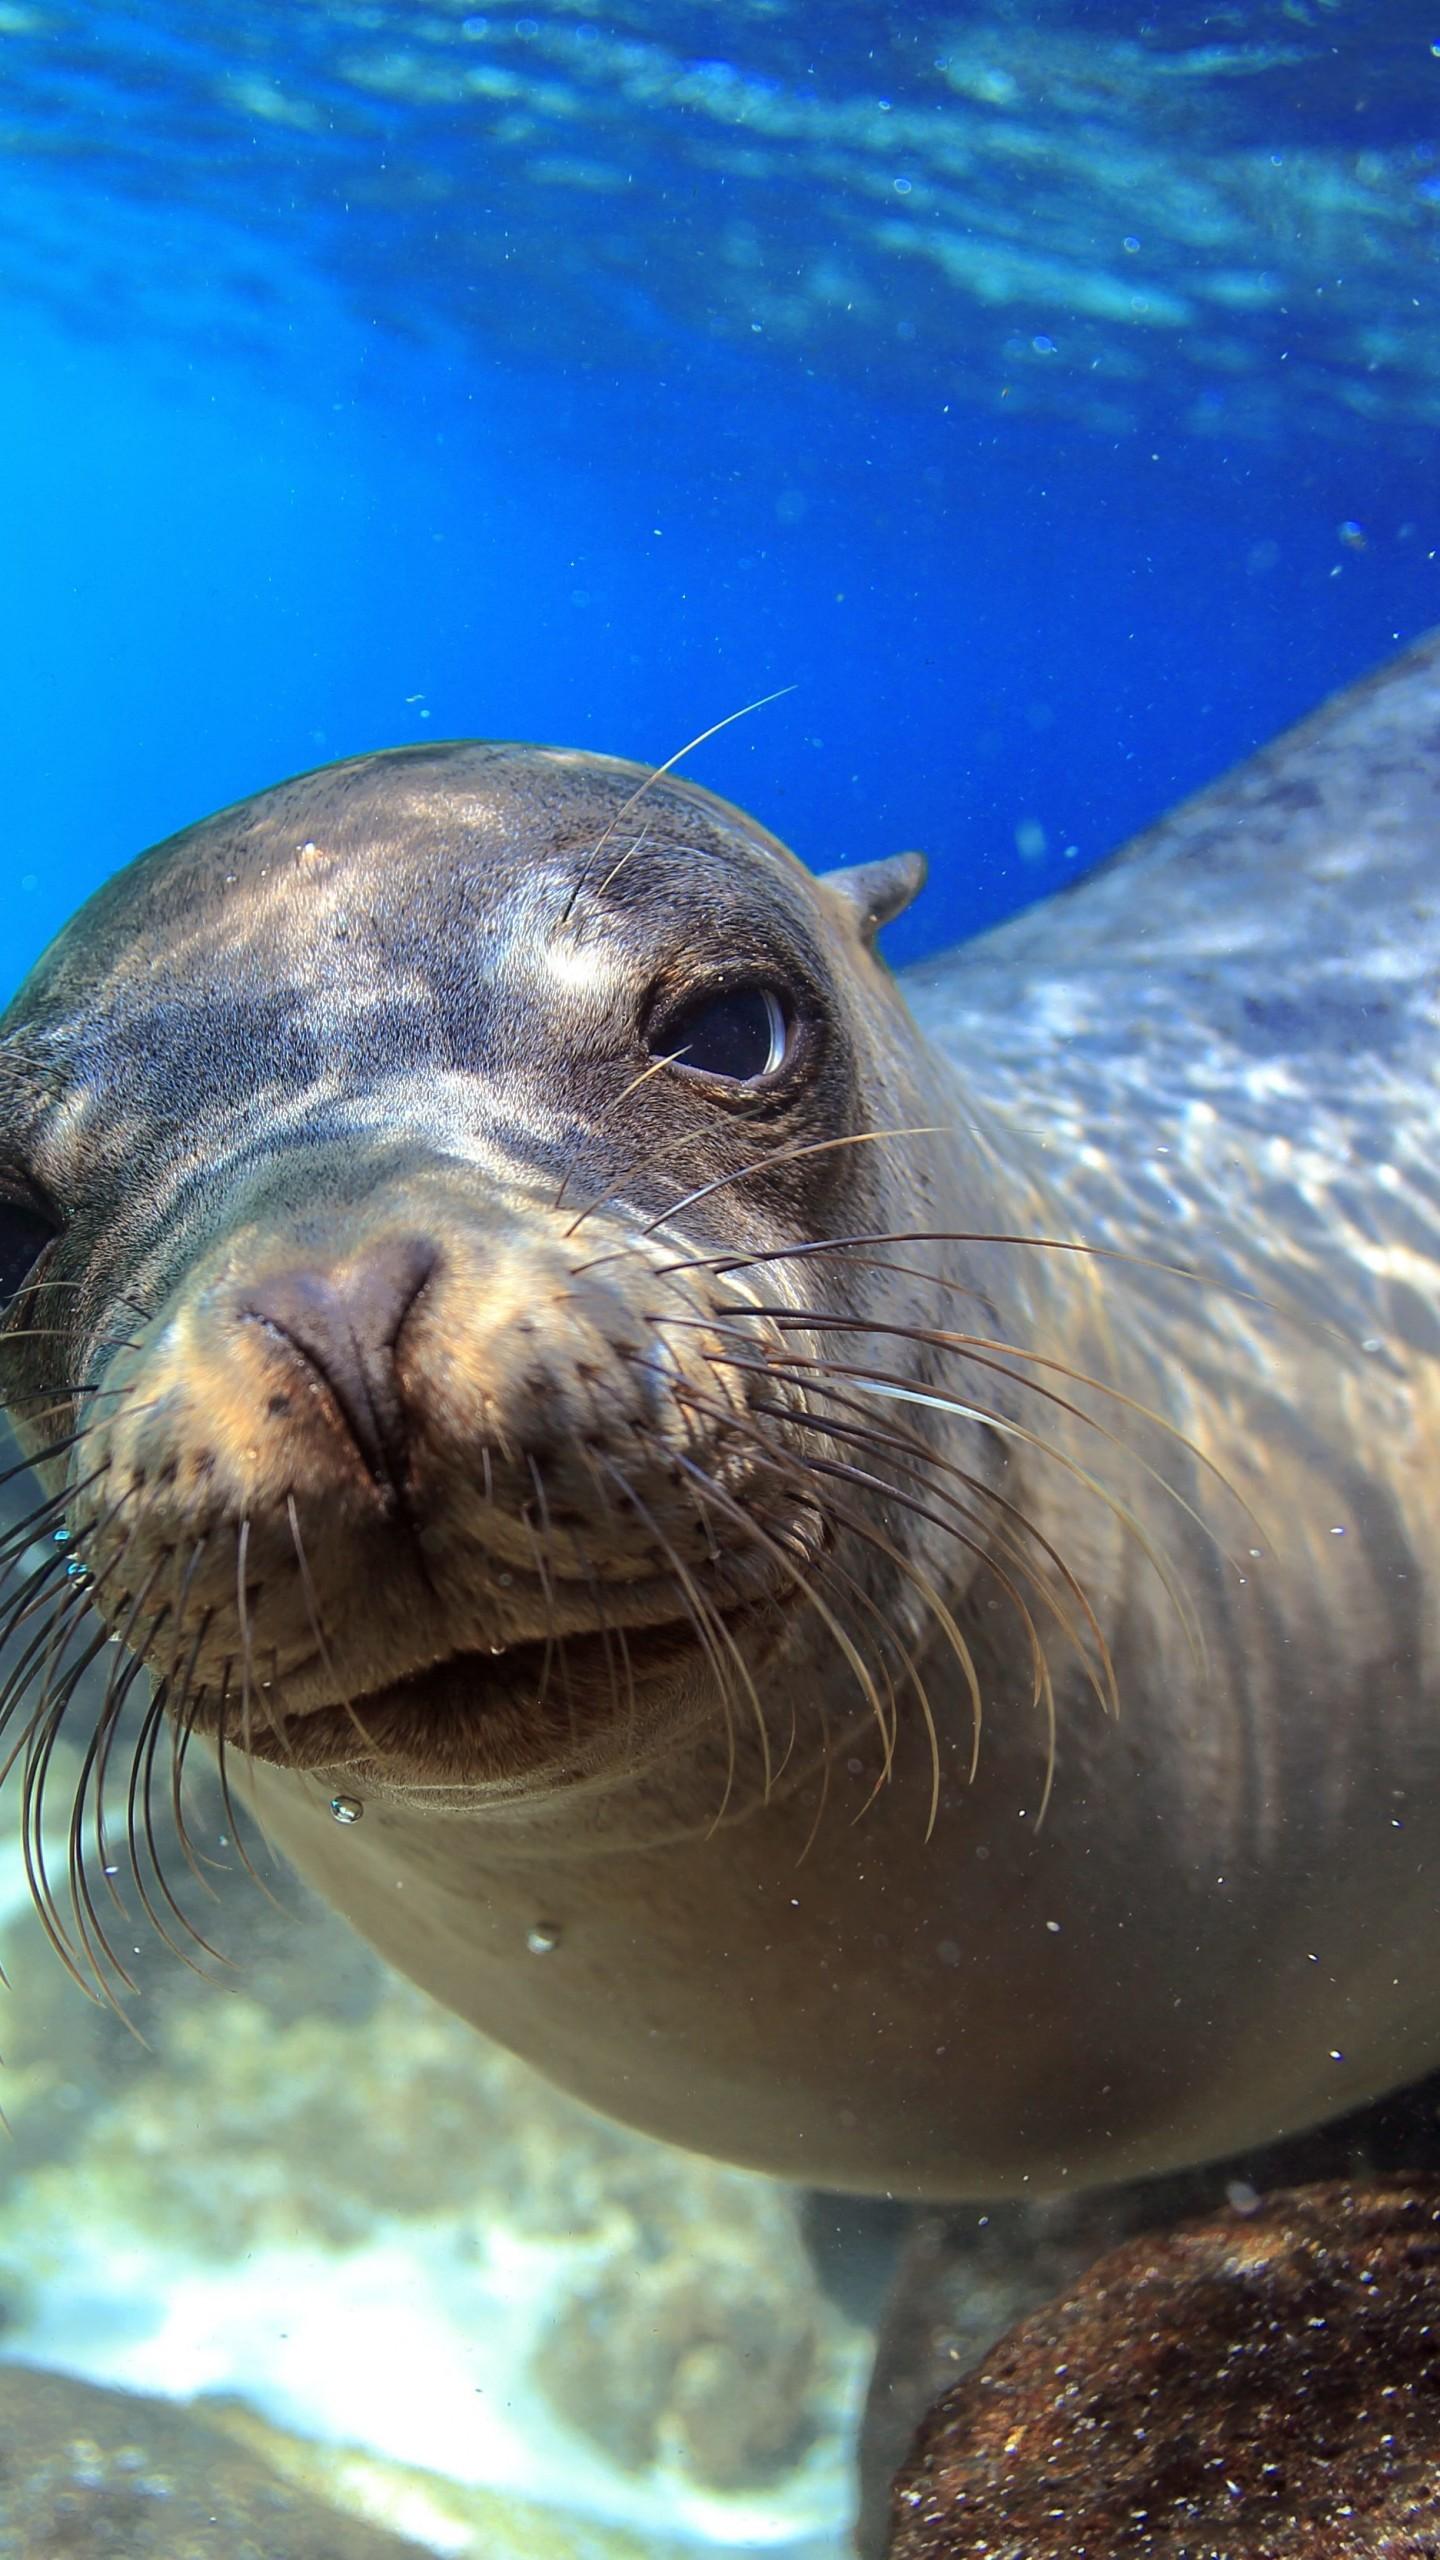 Www Hd Animal Wallpaper Com Wallpaper Sea Lion Galapagos Island Ecuador Underwater